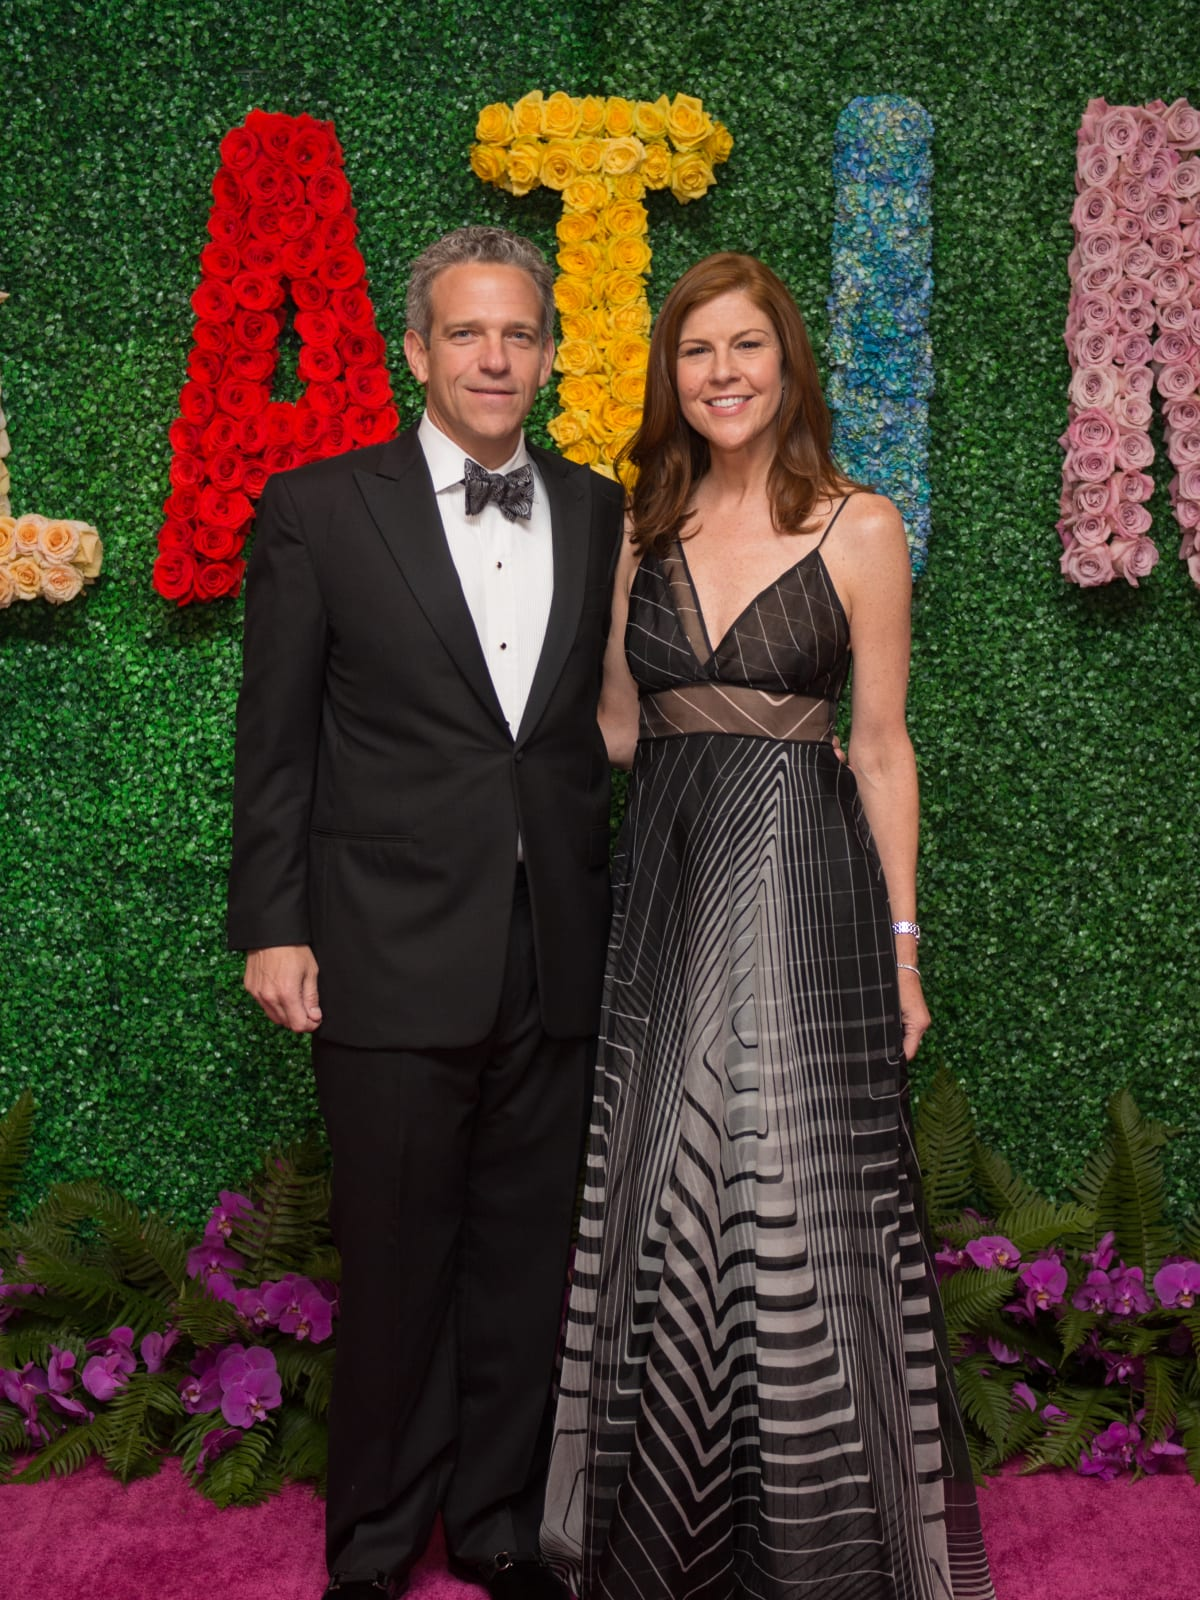 Mary Lile, Tom Lile at Latin American Gala